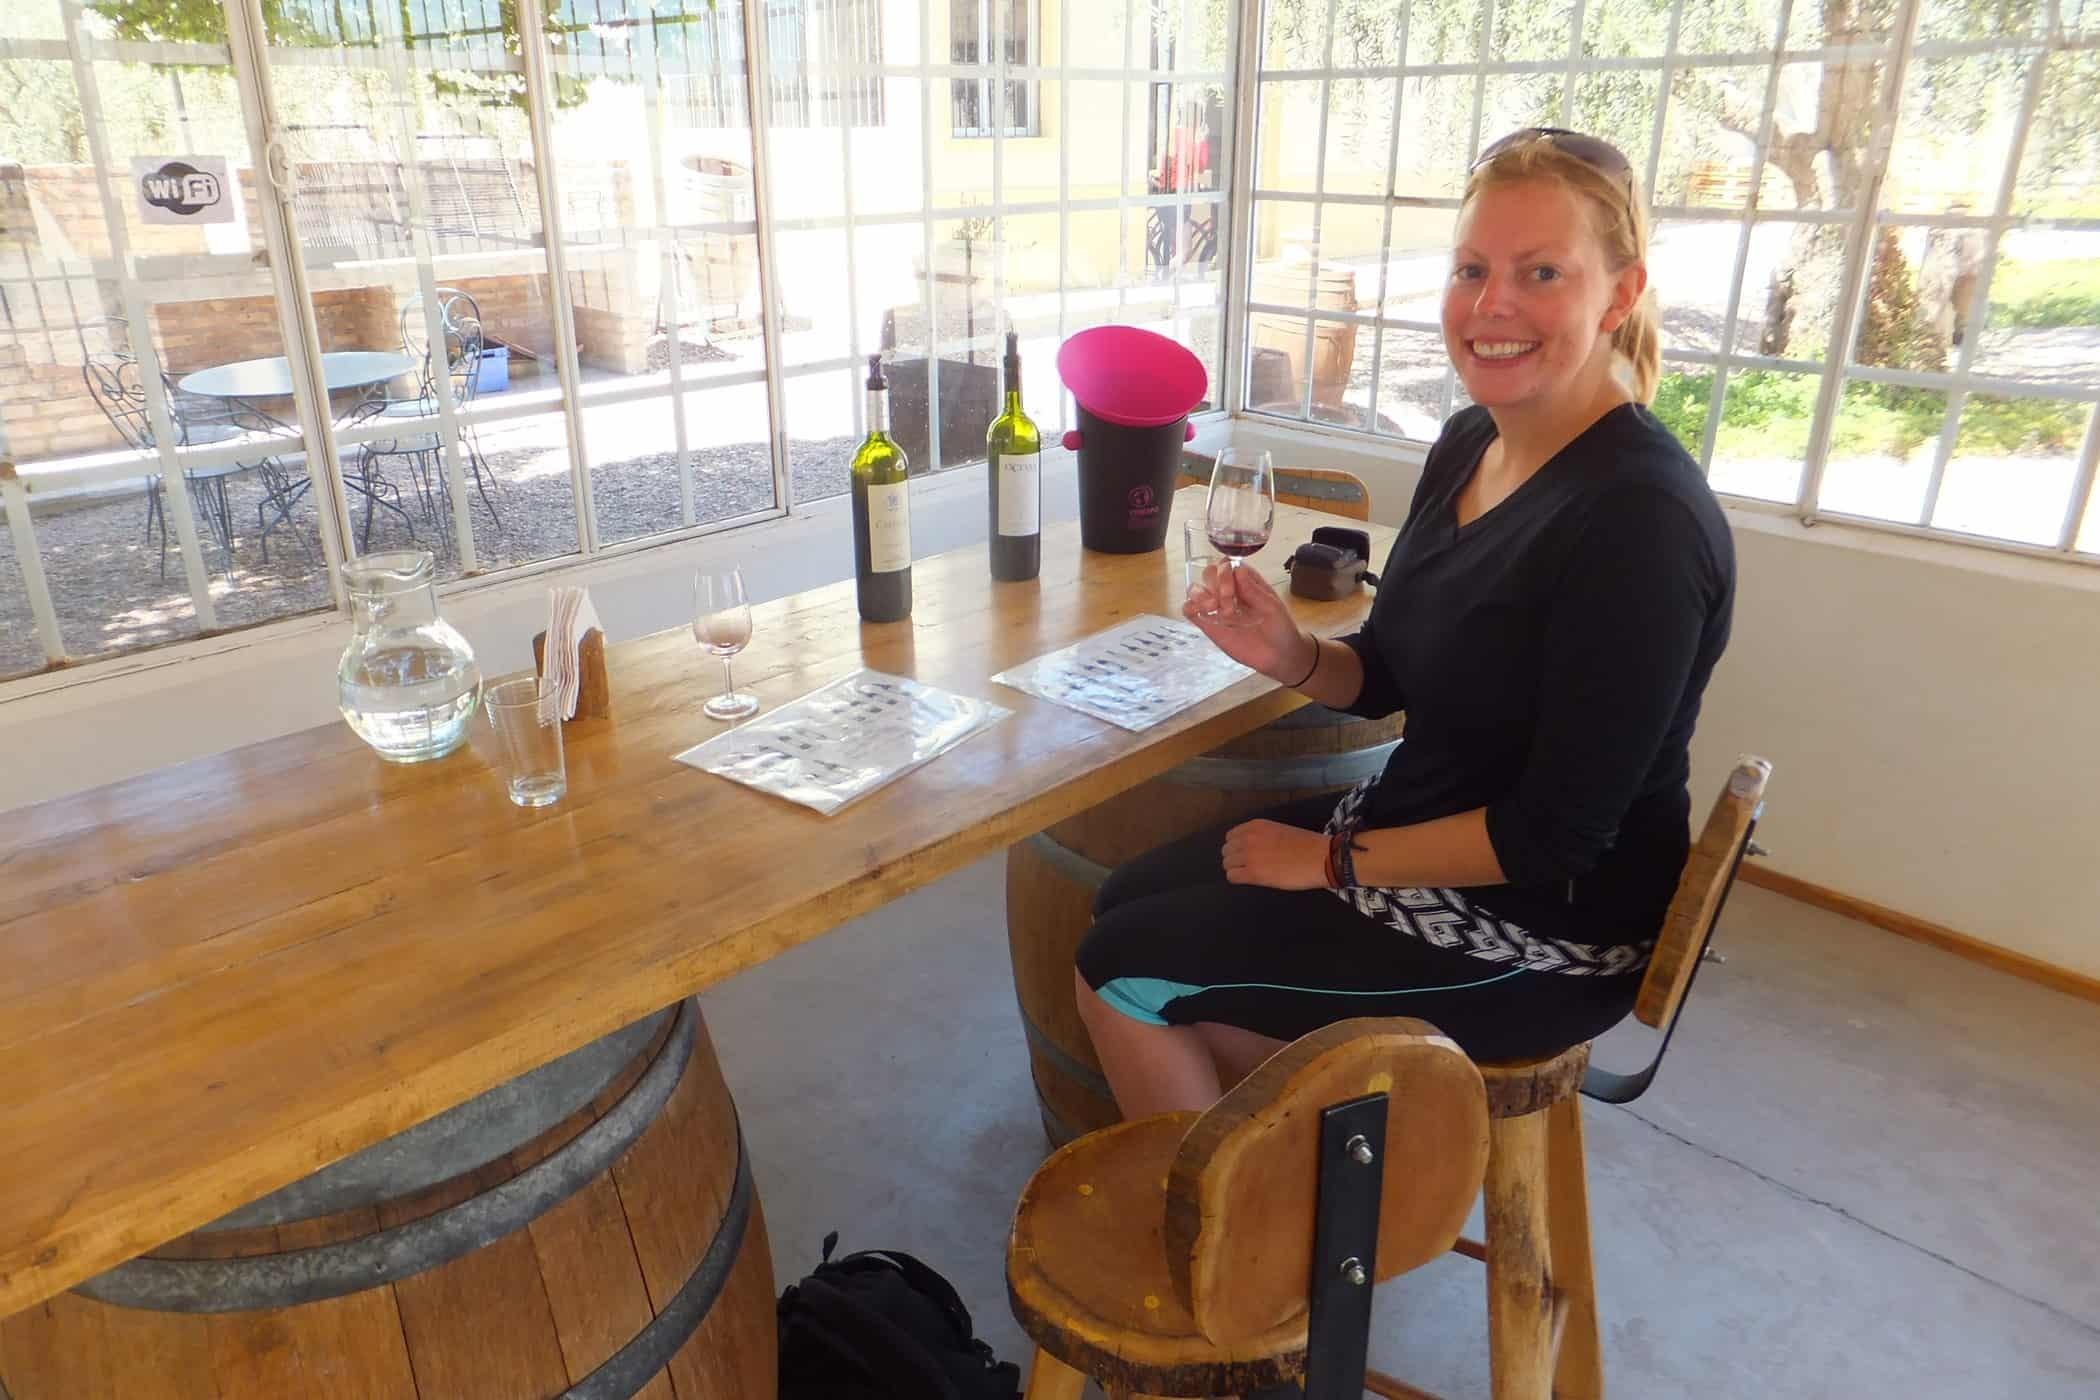 Wine tasting at Carinae, Mendoza, Argentina.